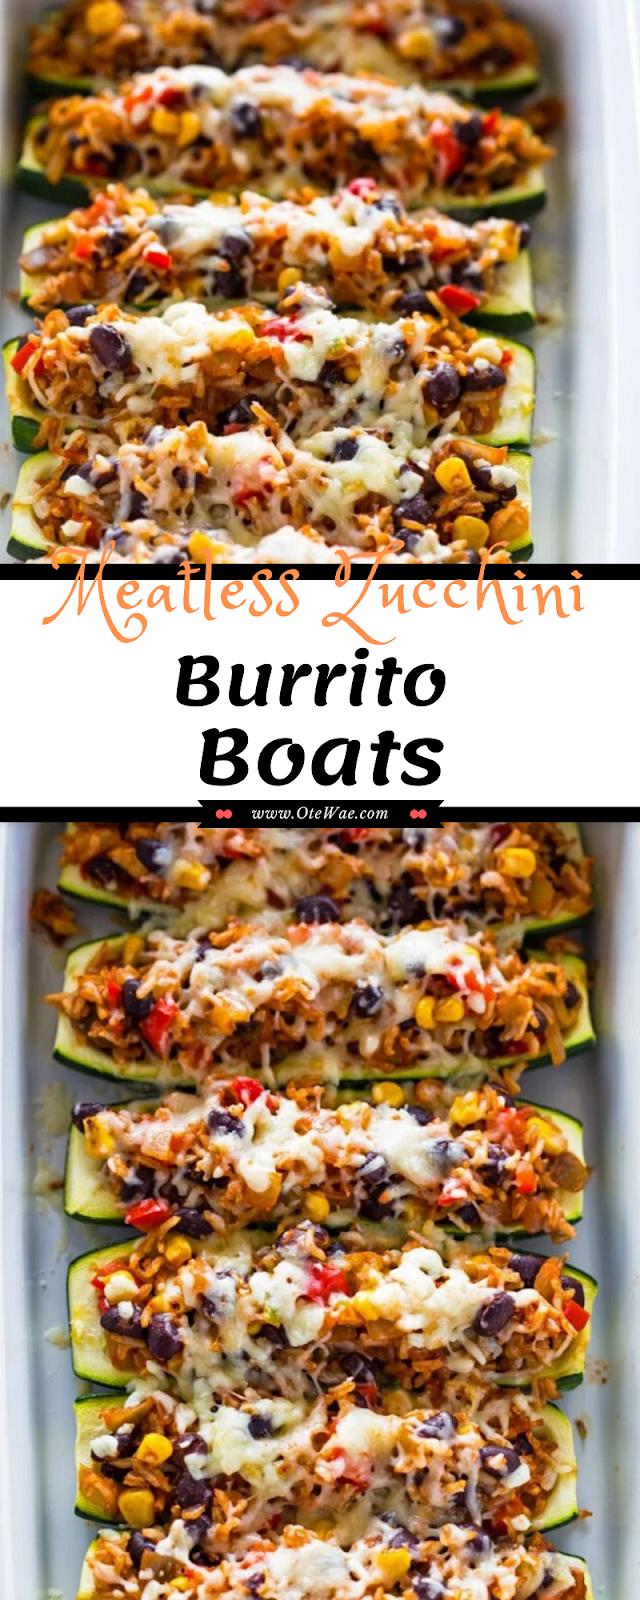 Meatless Zucchini Burrito Boats